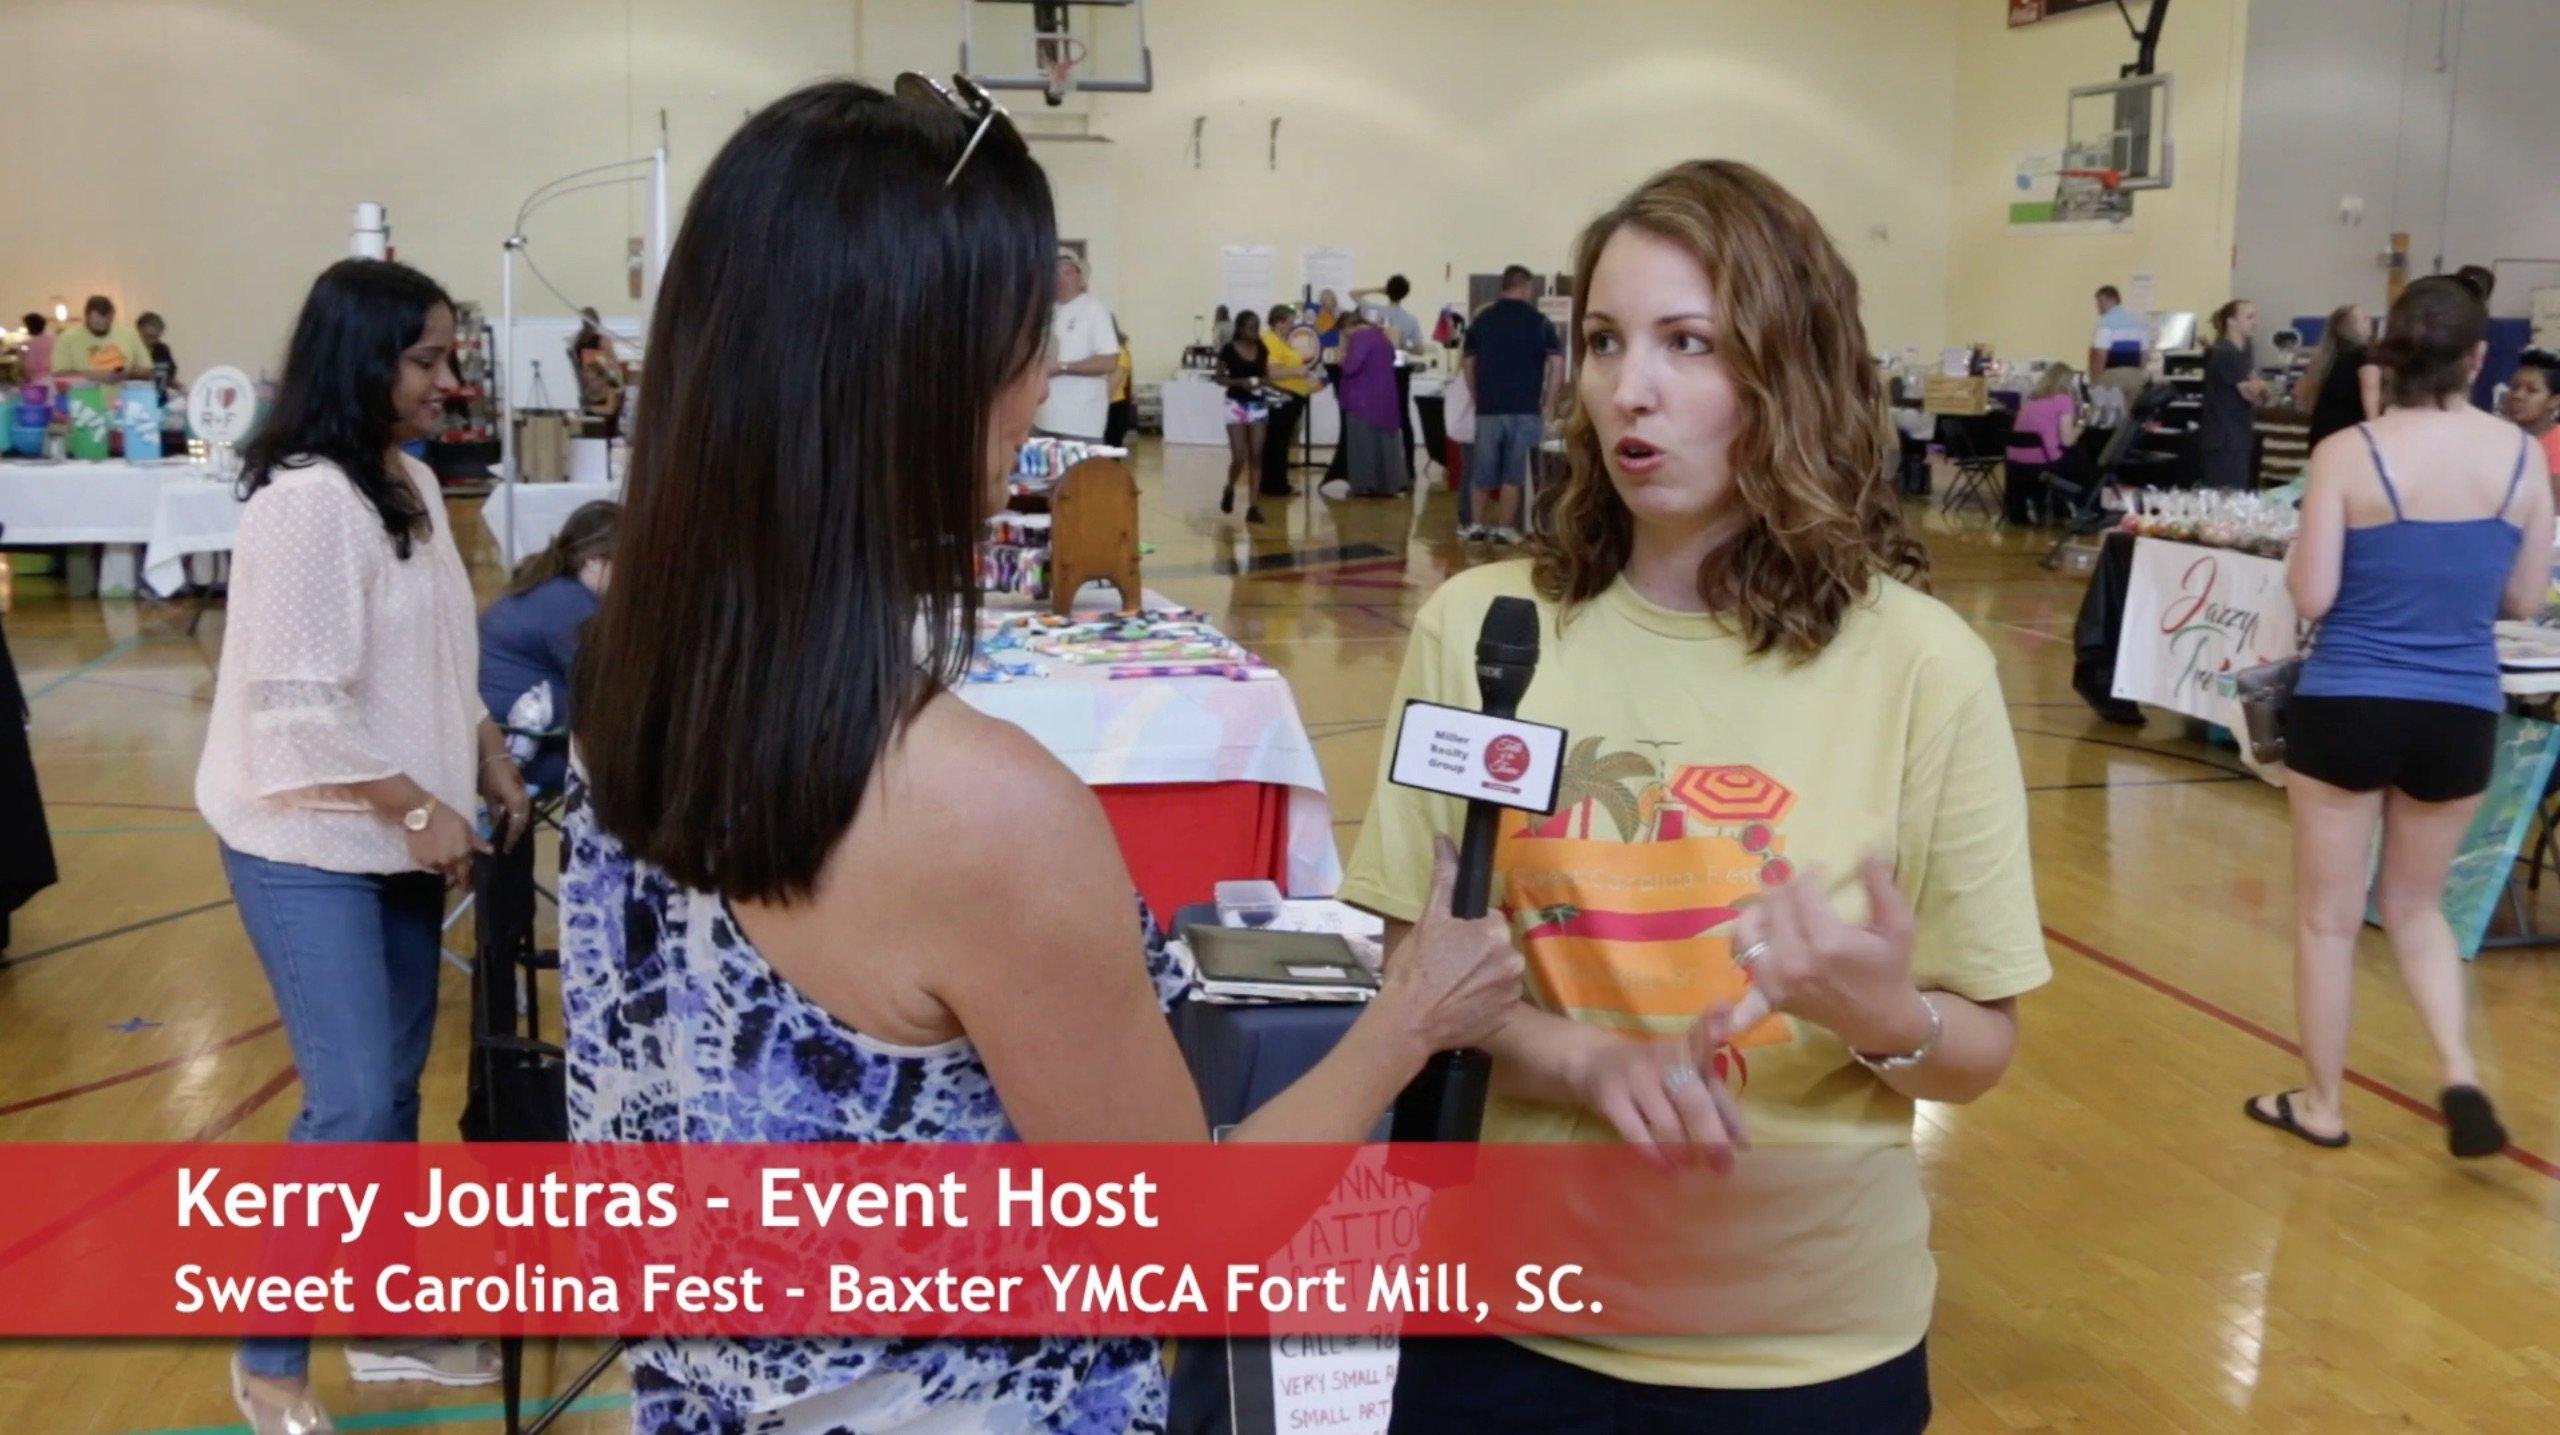 Sweet Carolina Fest @ Baxter YMCA